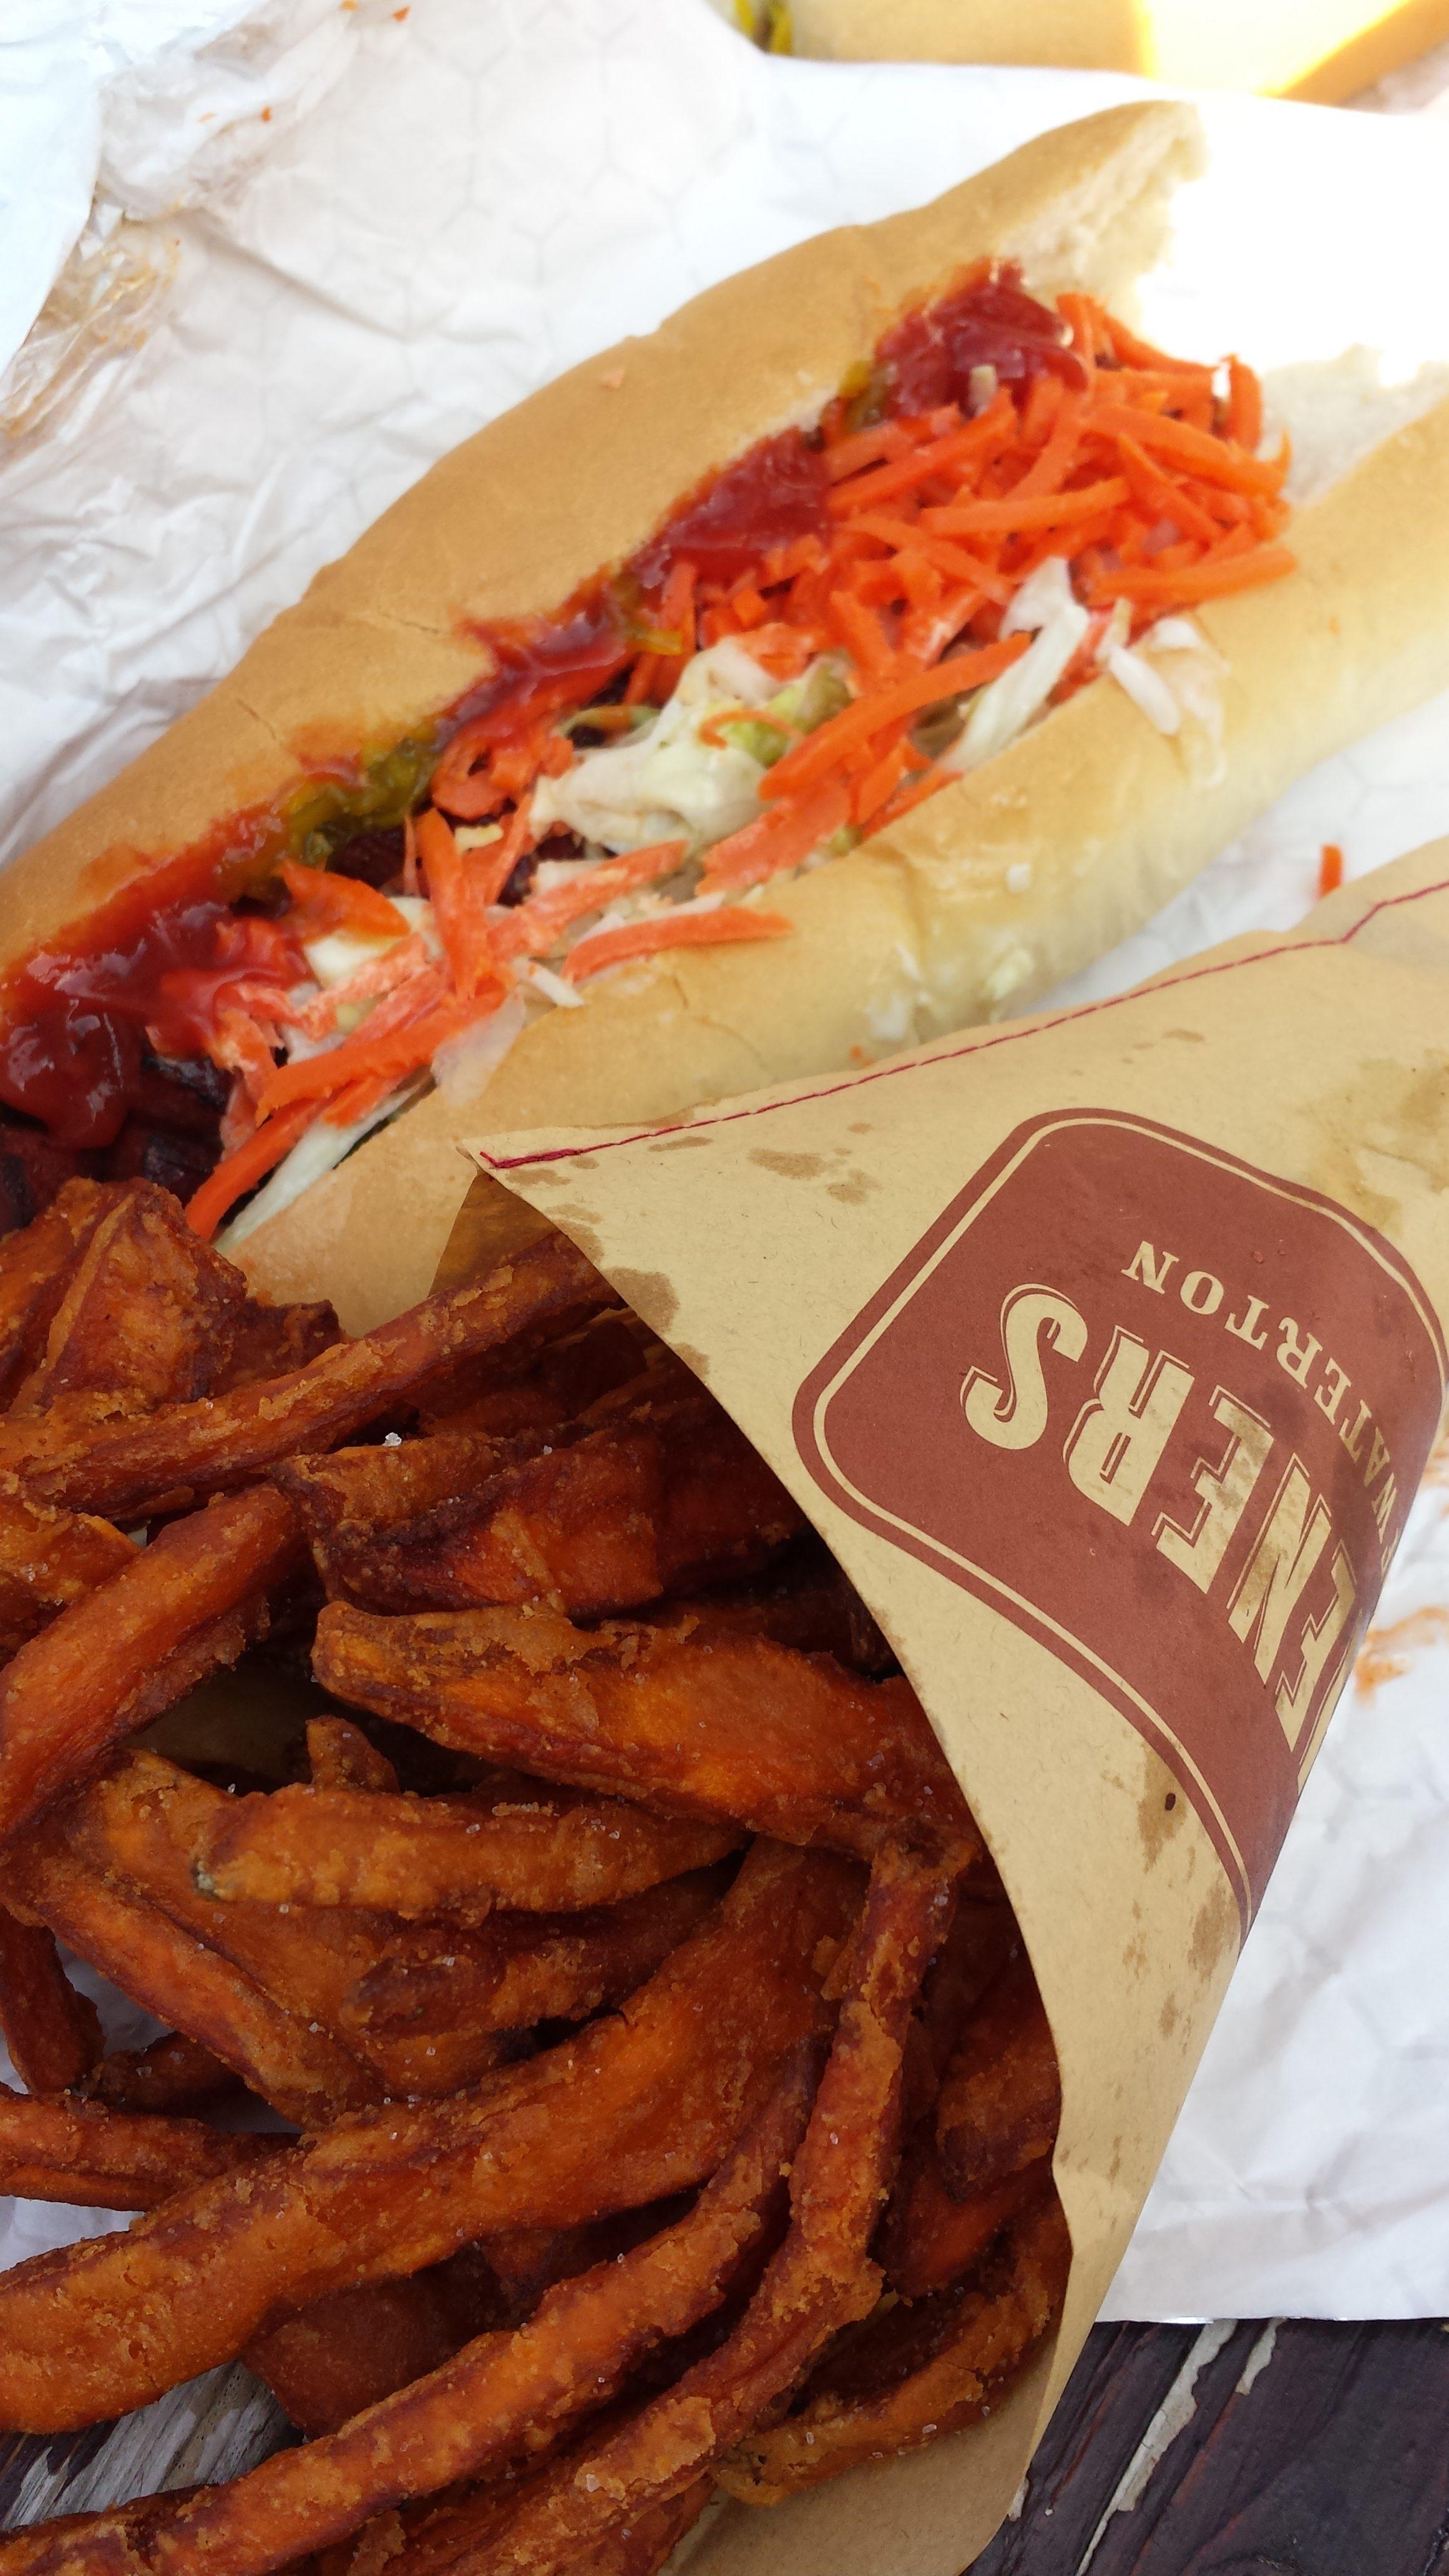 Wiener and fries